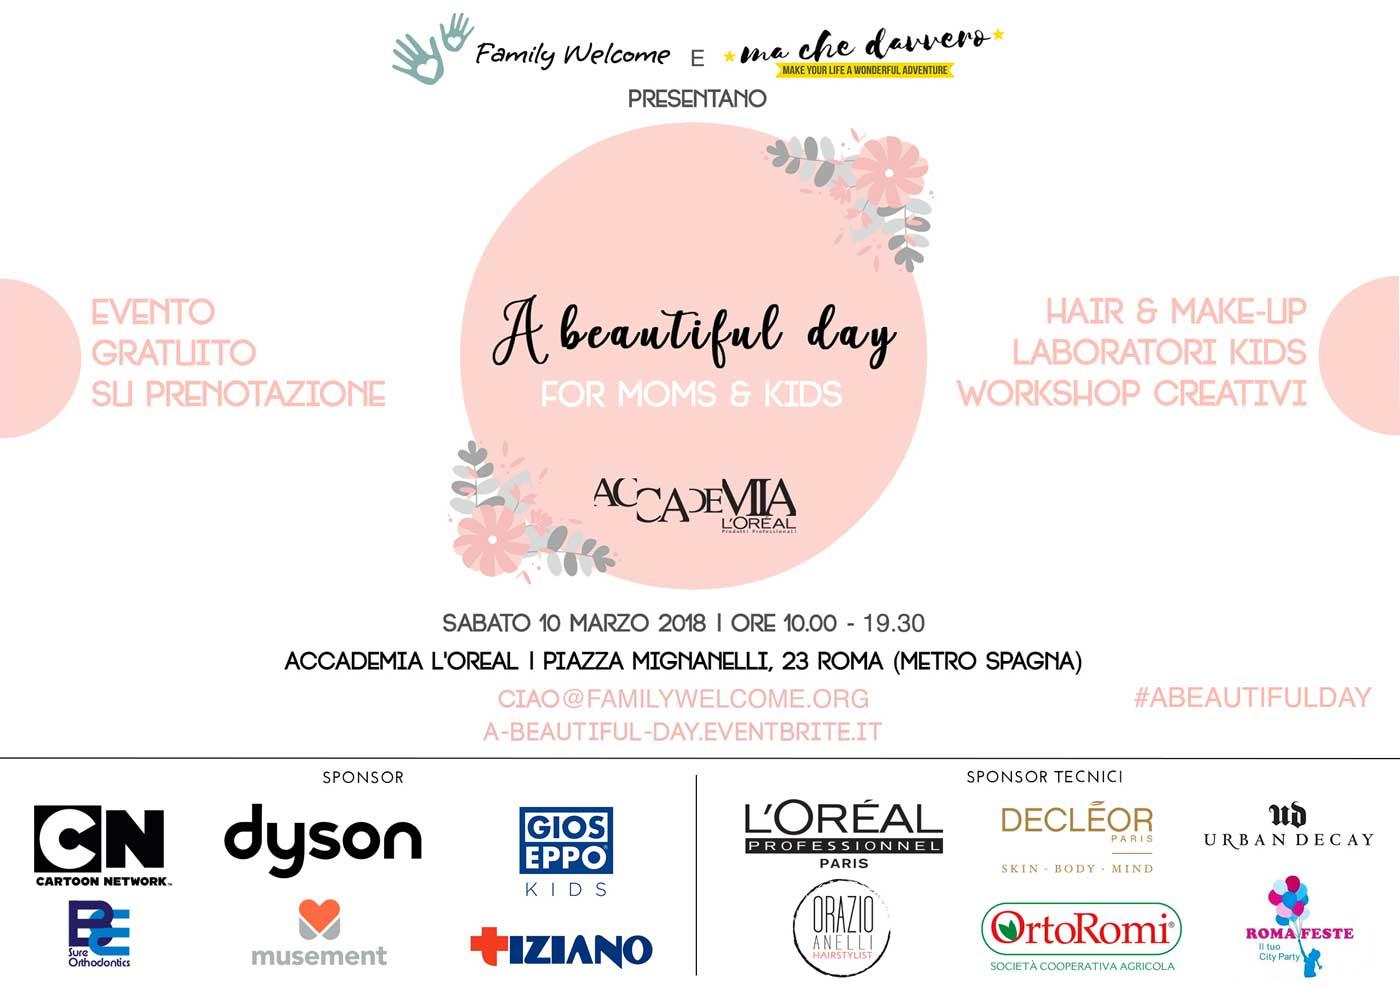 a beautiful day evento machedavvero e family welcome